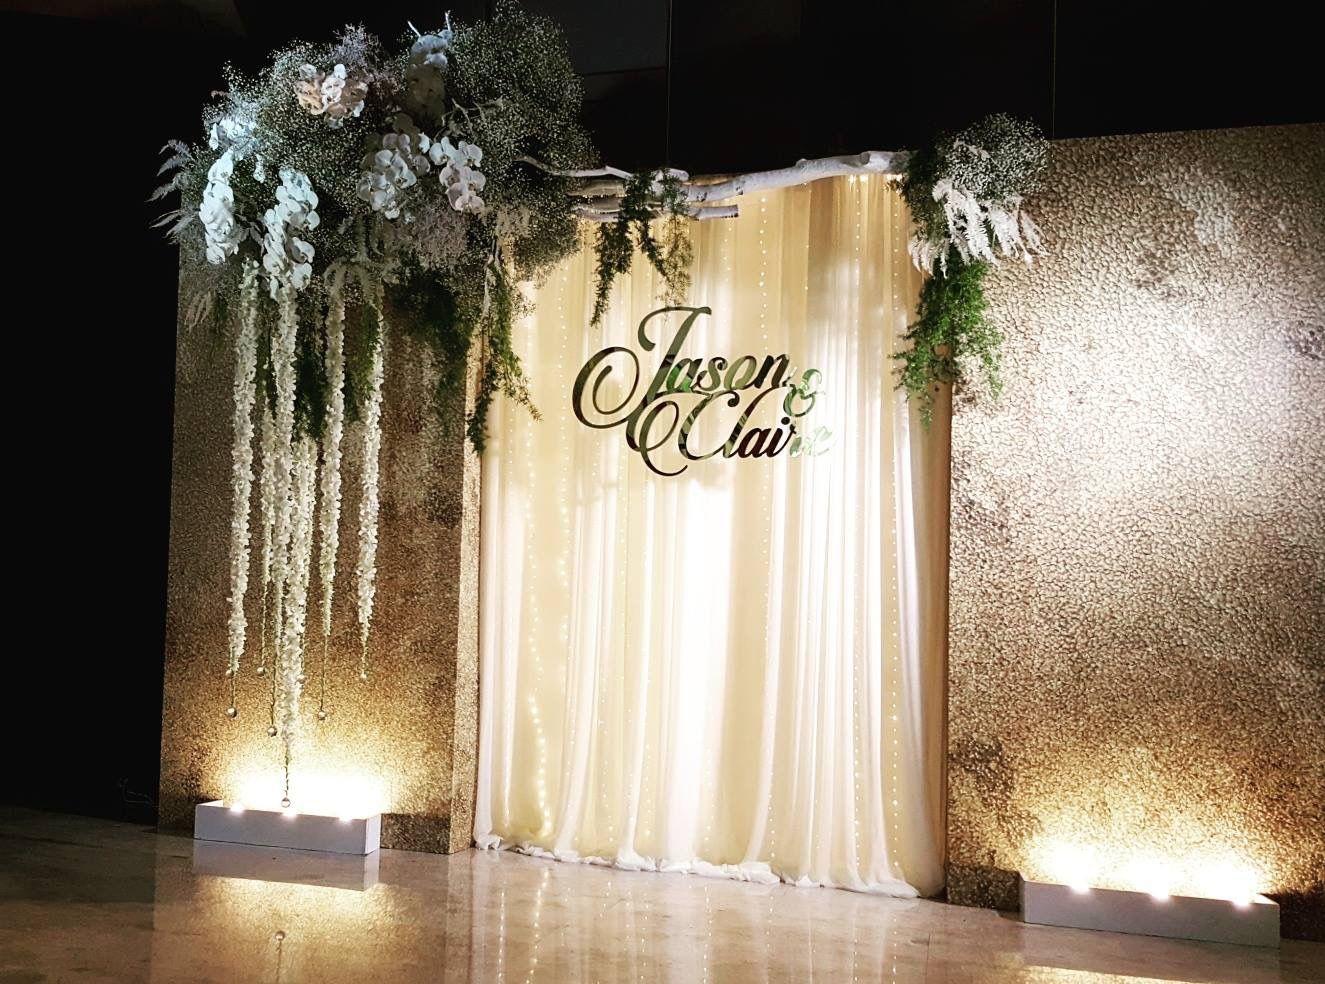 Pin by jessica wang on wedding decor pinterest for Wedding wall decor